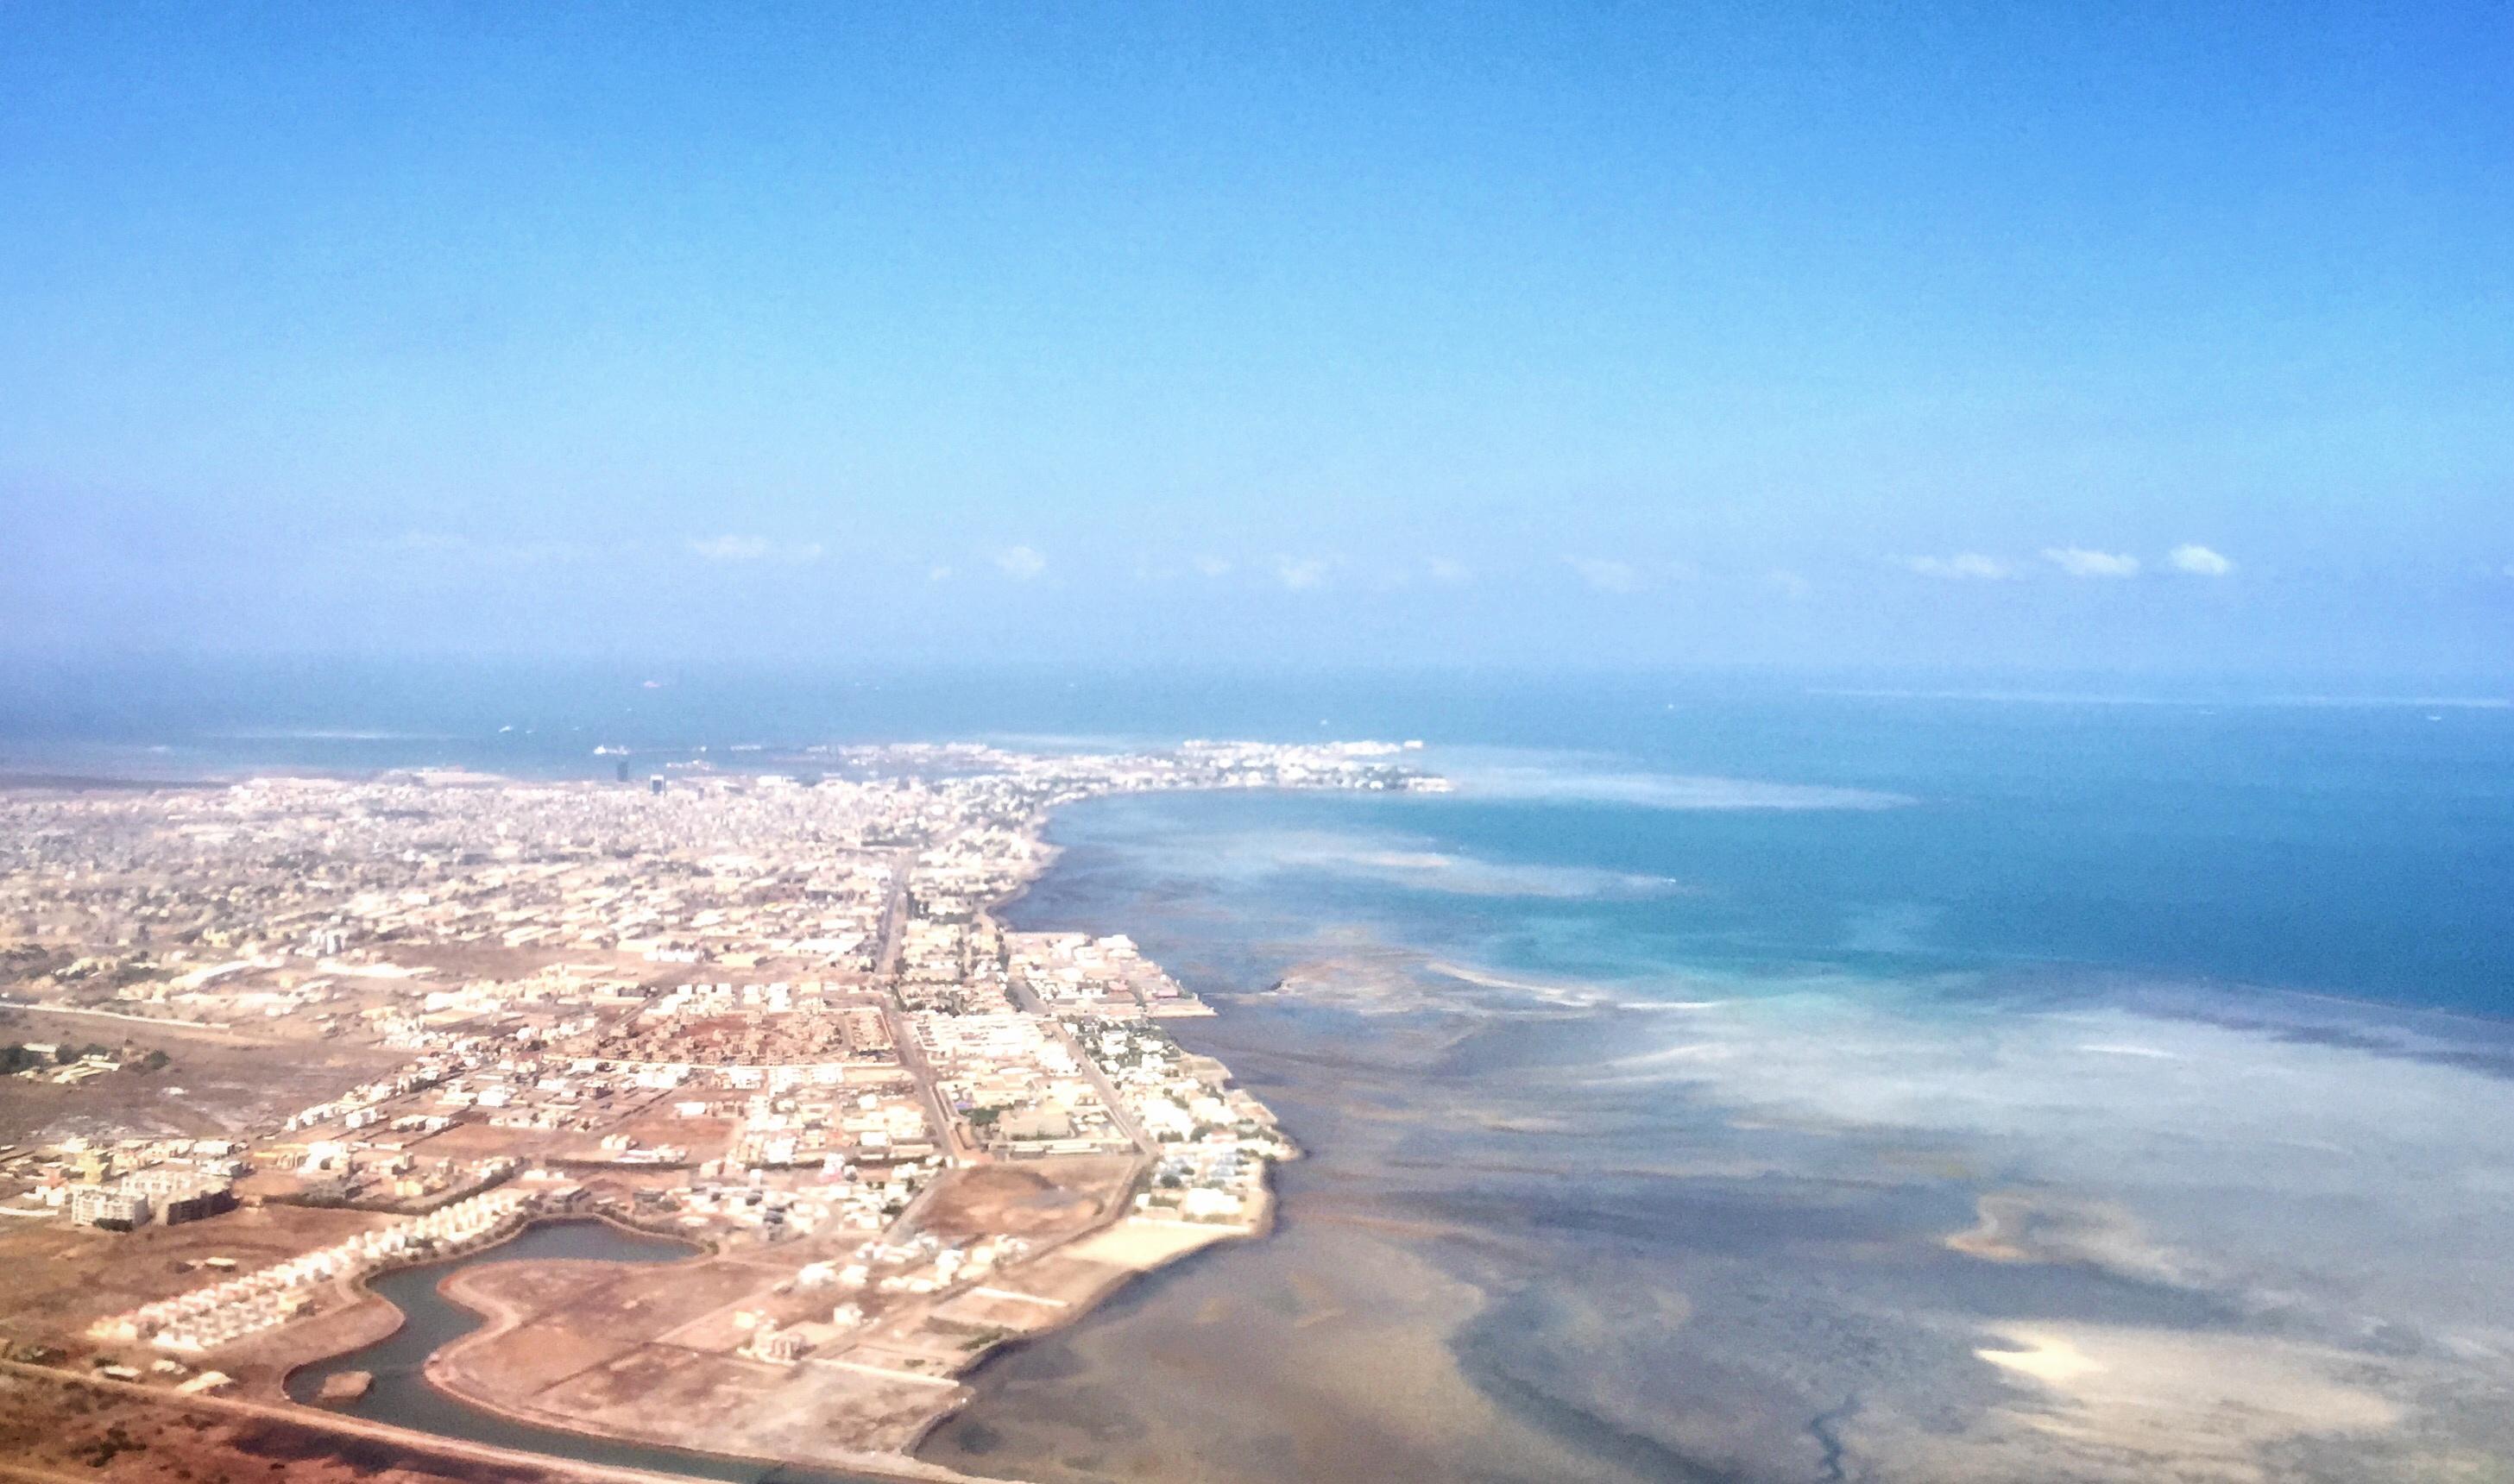 Djibouti City Air Landing travelling to Djibouti